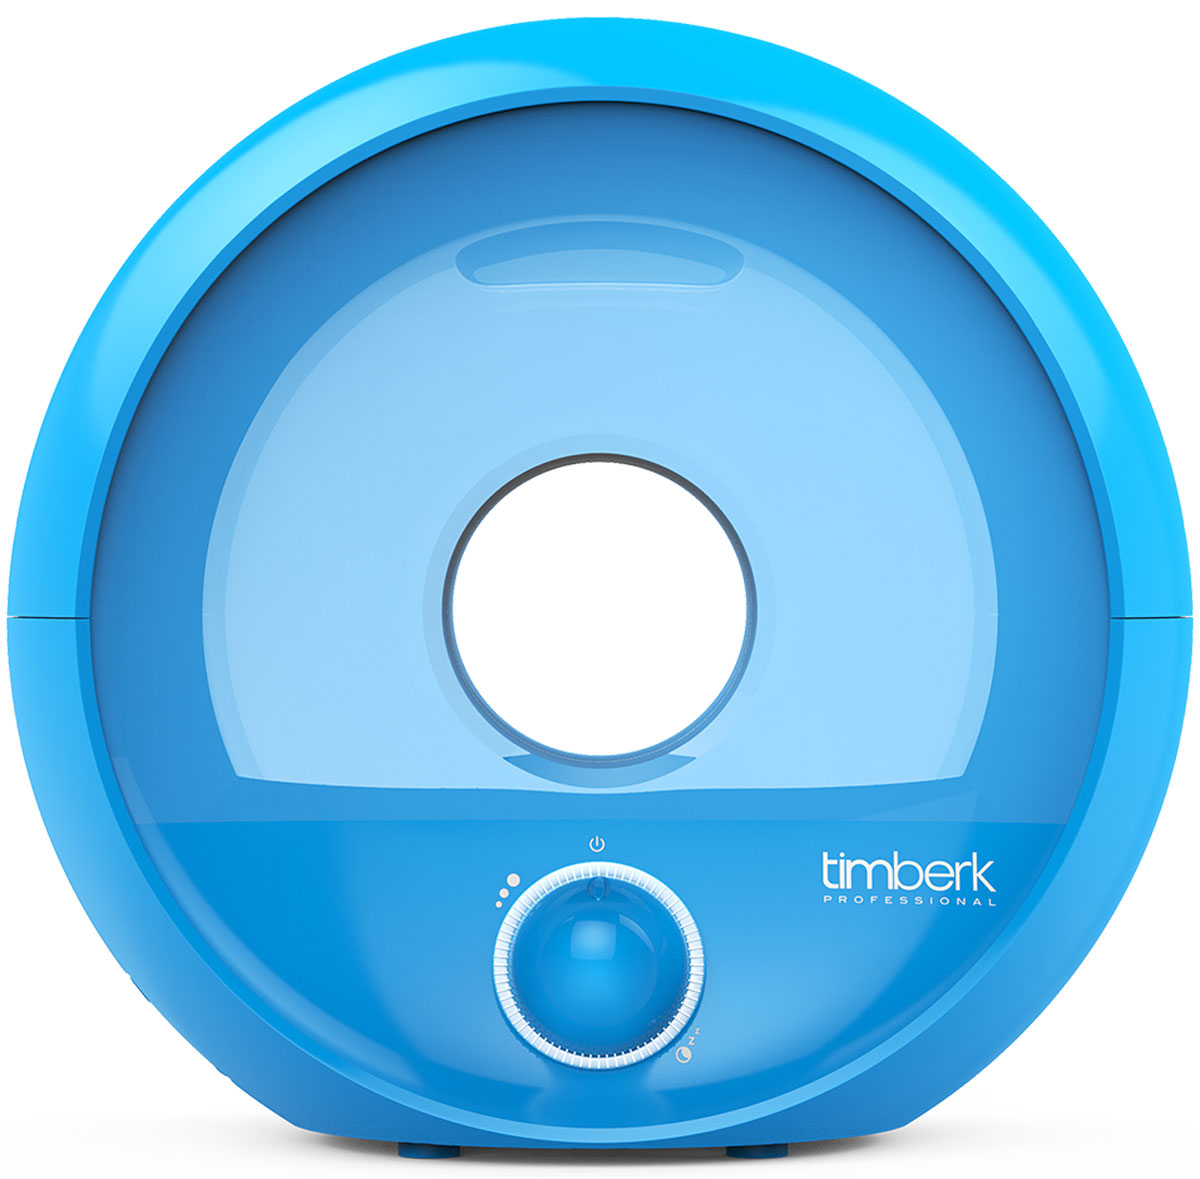 Timberk THU UL 09, Blue увлажнитель воздуха